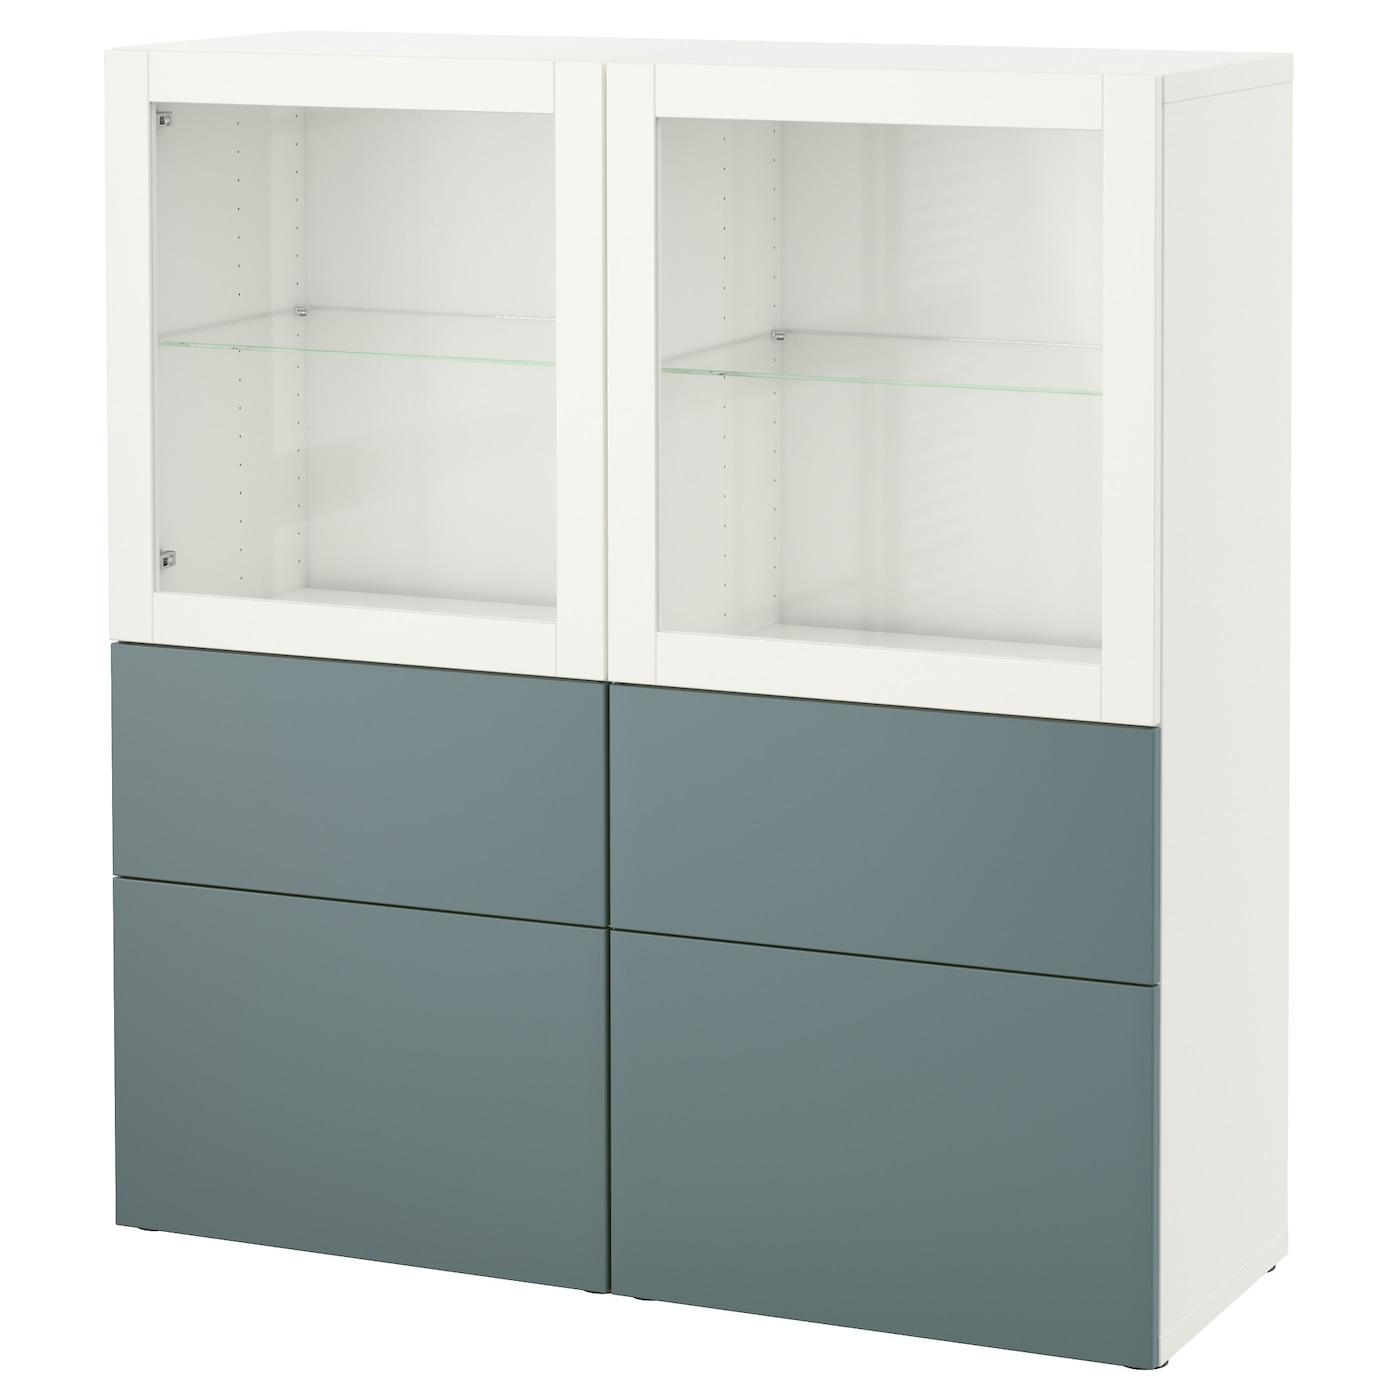 best storage combination w glass doors white valviken grey turquoise clear glass 120x40x128 cm. Black Bedroom Furniture Sets. Home Design Ideas